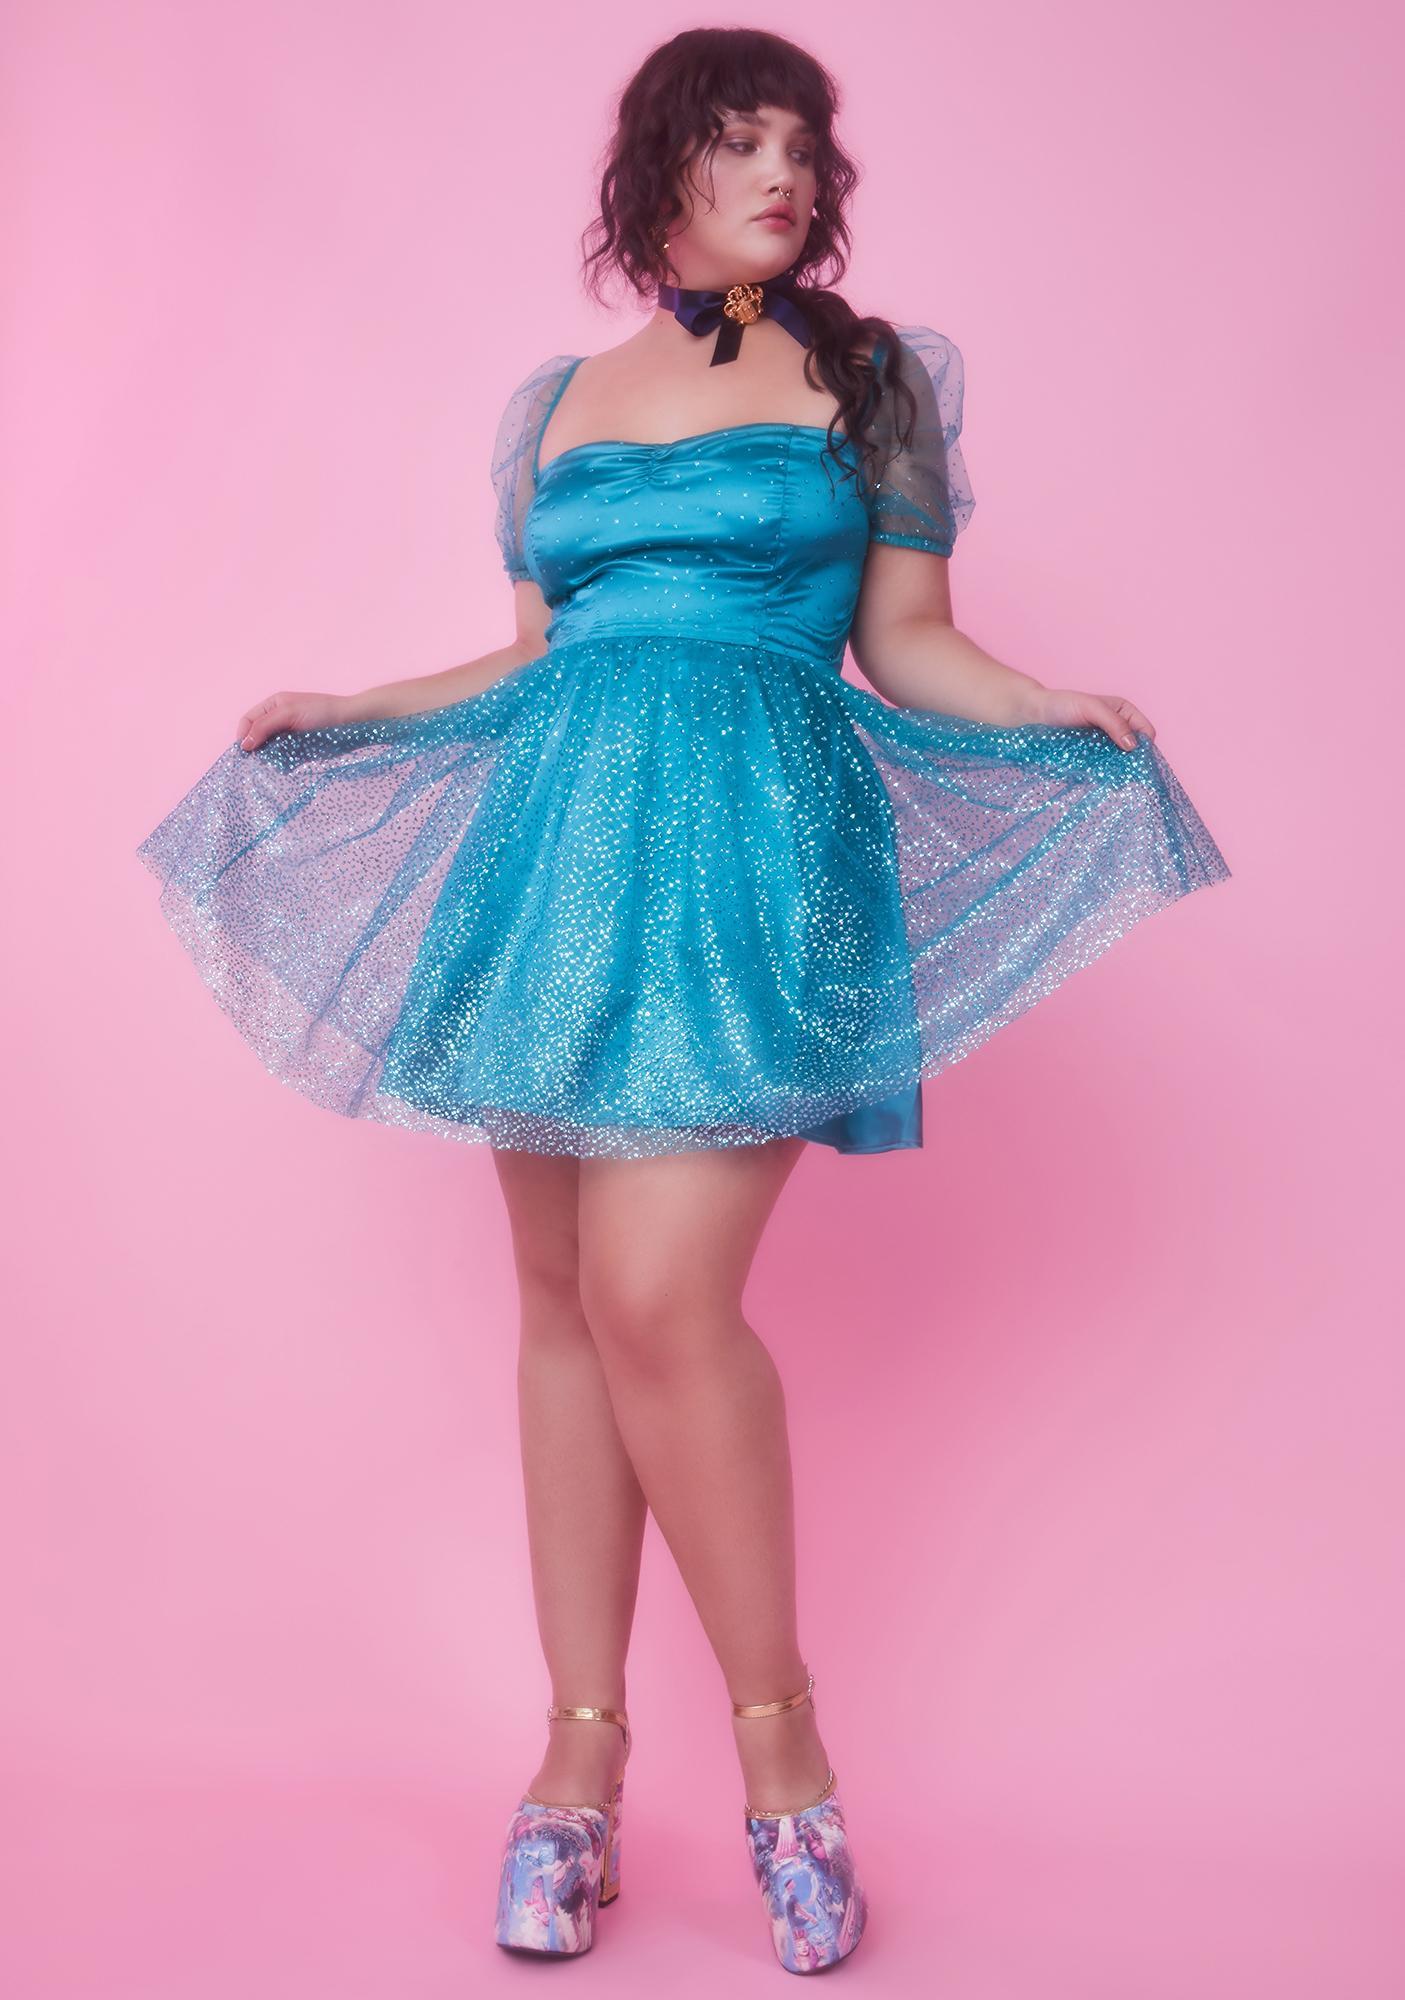 Sugar Thrillz My Diamonds Are Forever Babydoll Dress